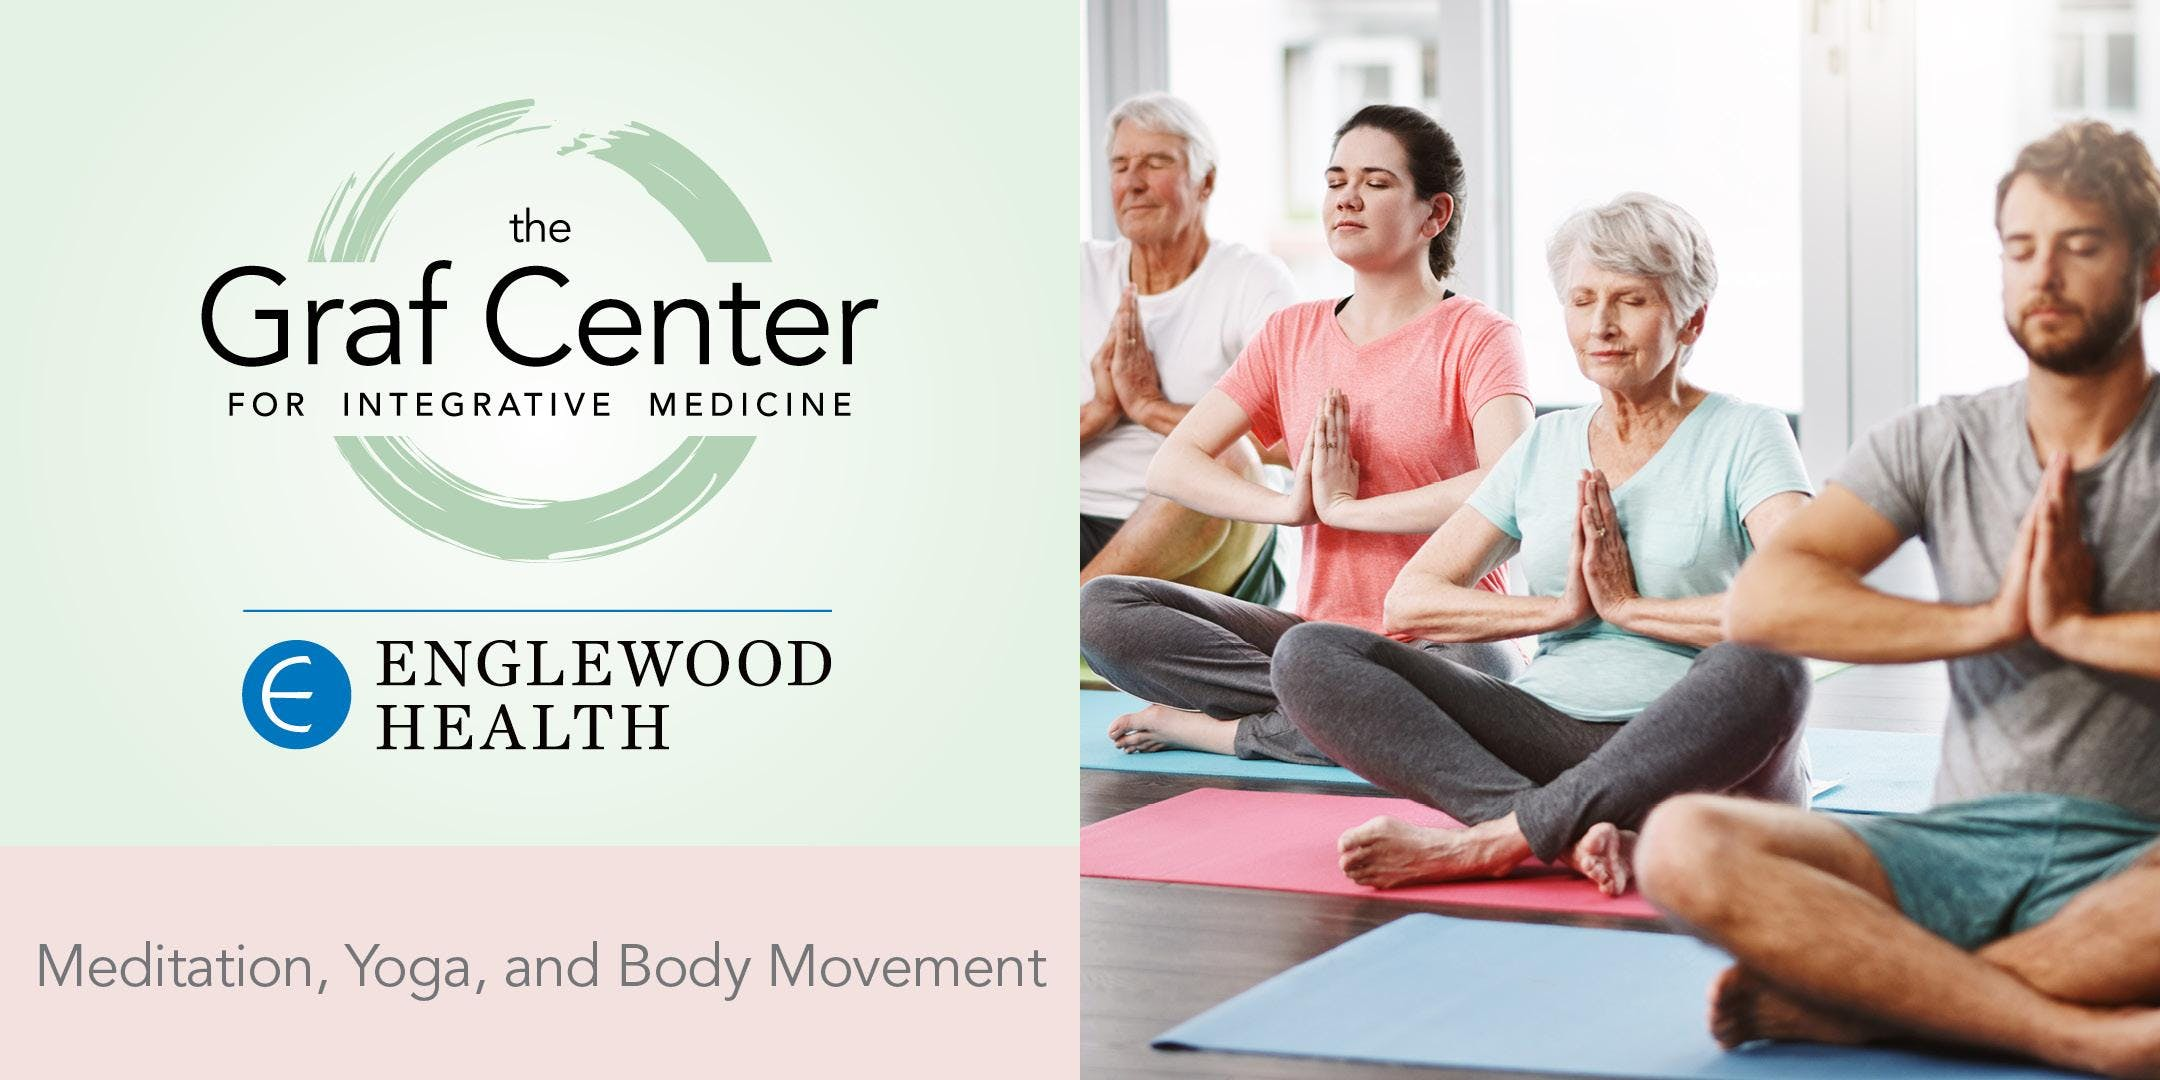 More info: Mindful Meditation for Wellness